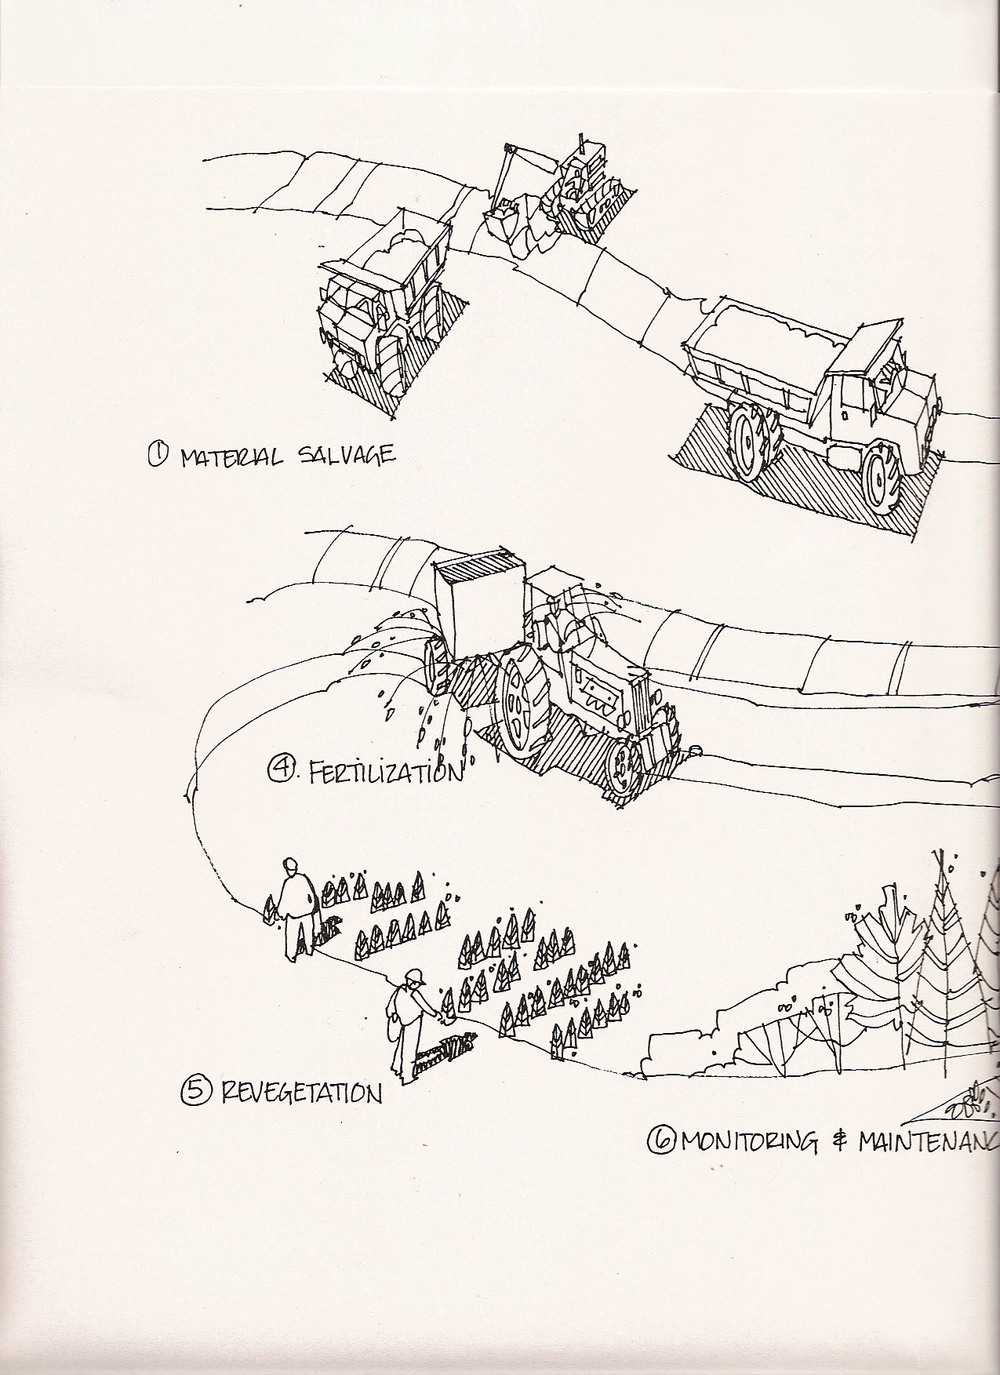 process line drawing-4351903079.jpg